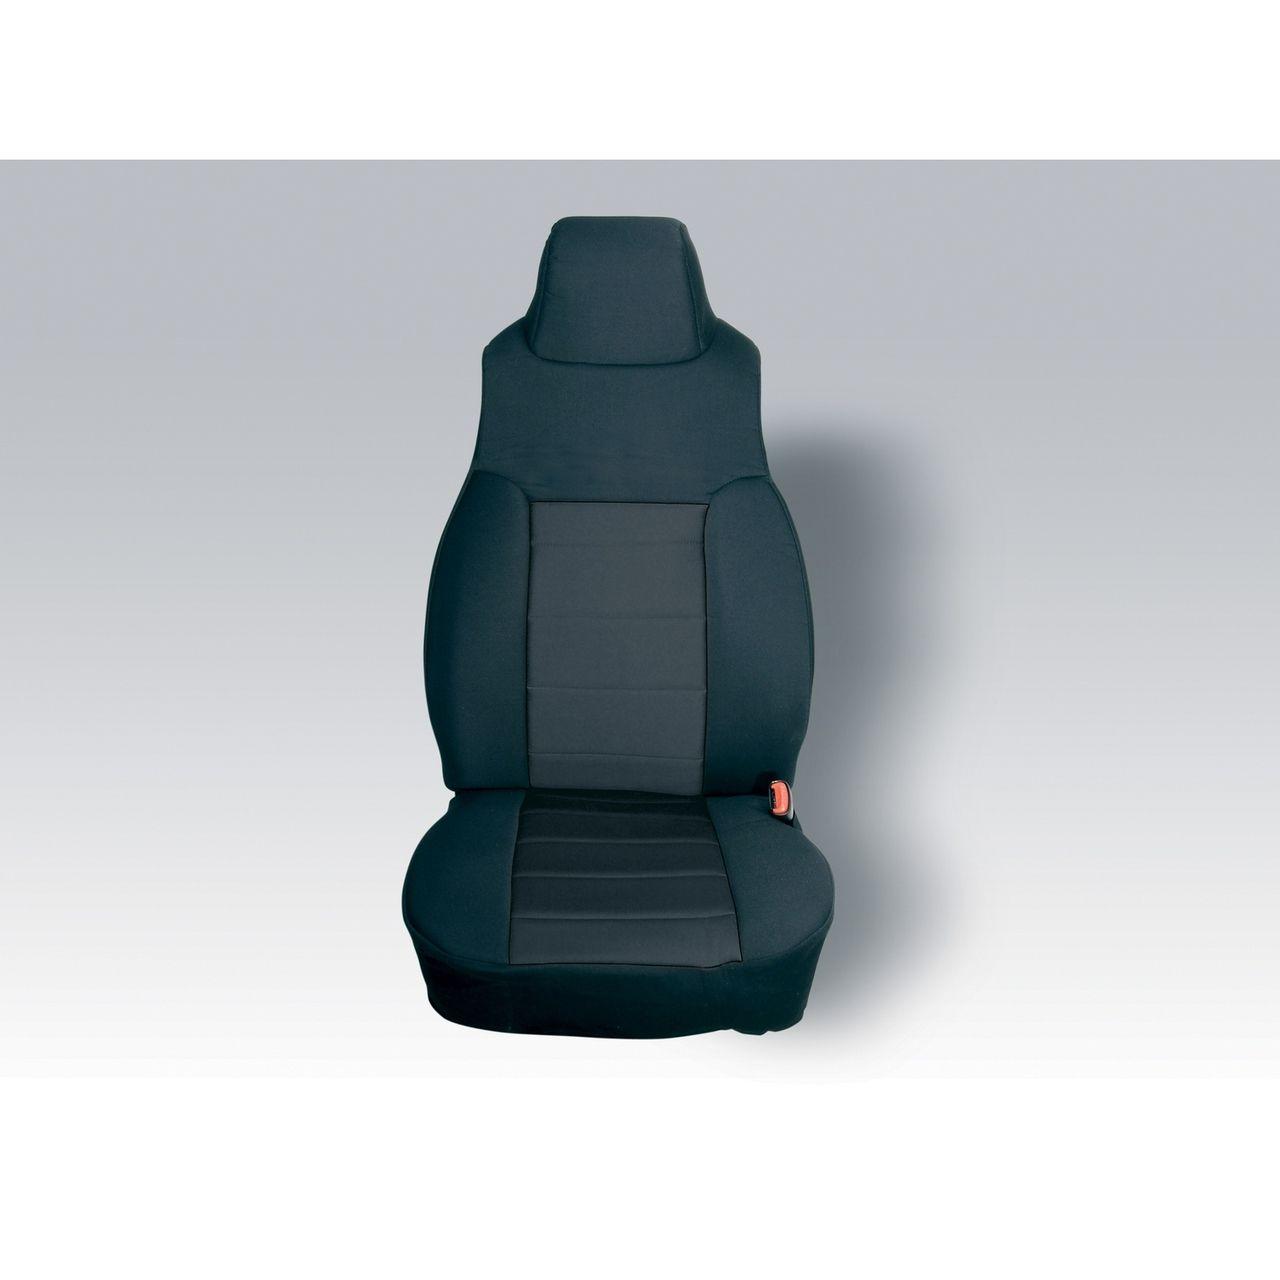 Rugged Ridge 13404.37 Spice Super Seat